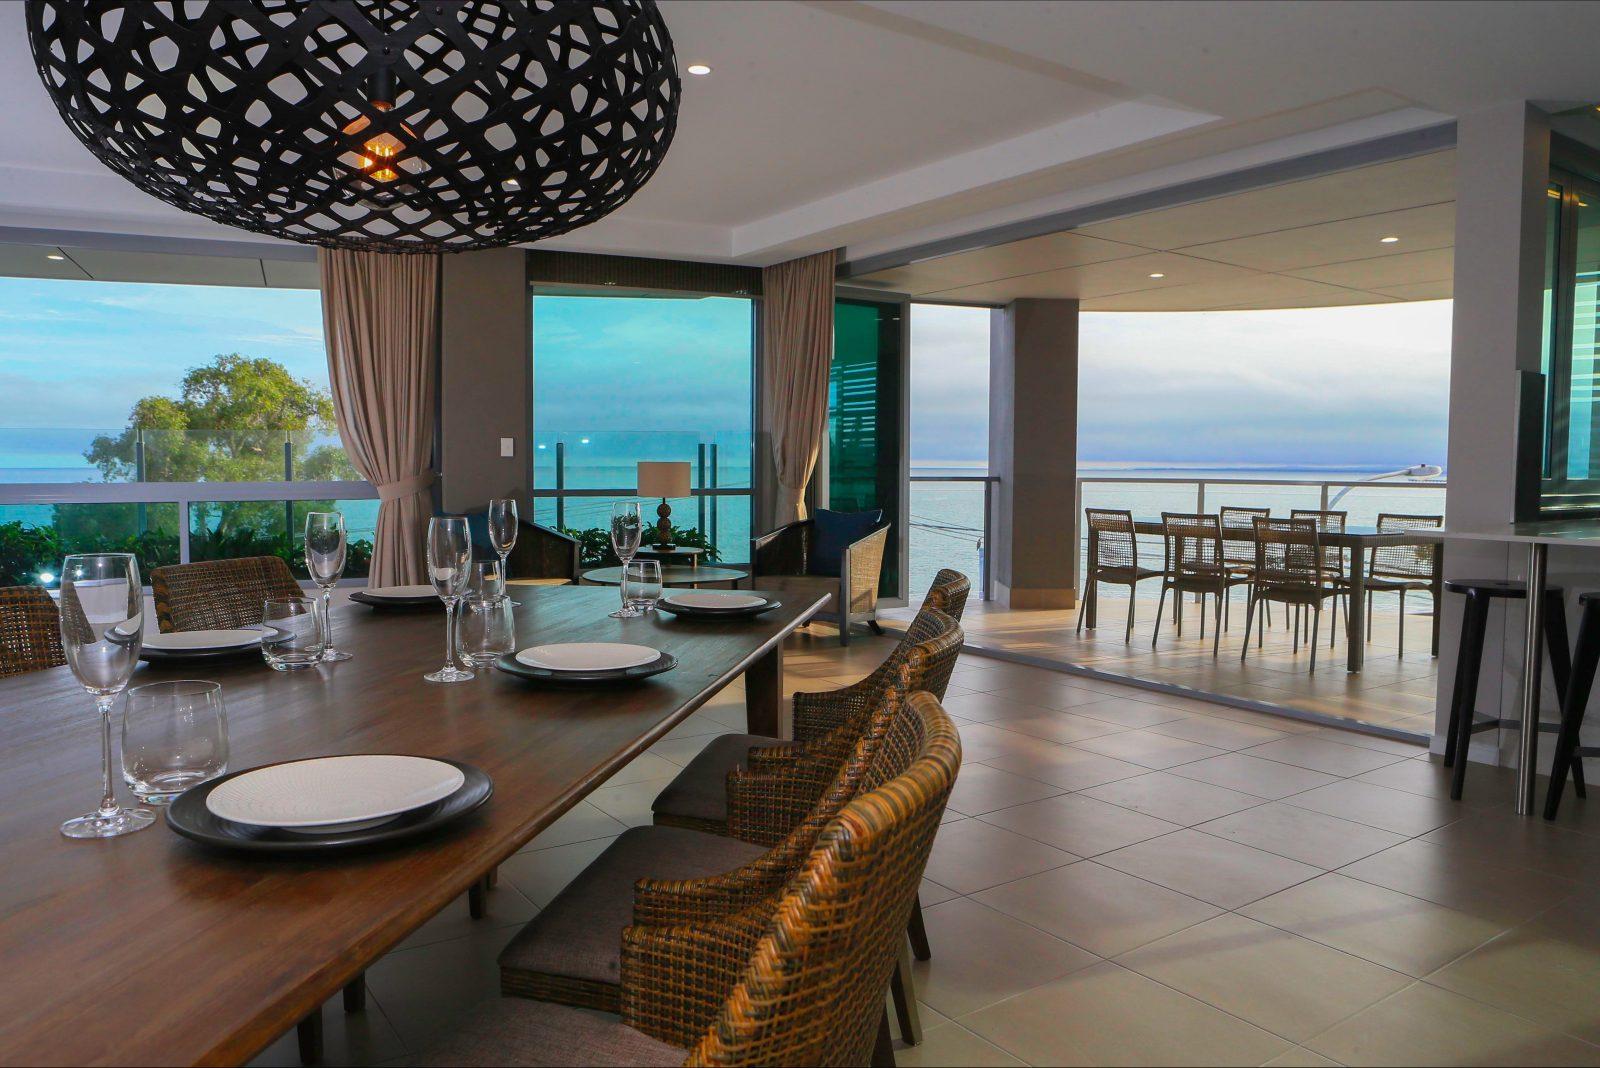 Aqua Aqua Luxury Penthouse dining room